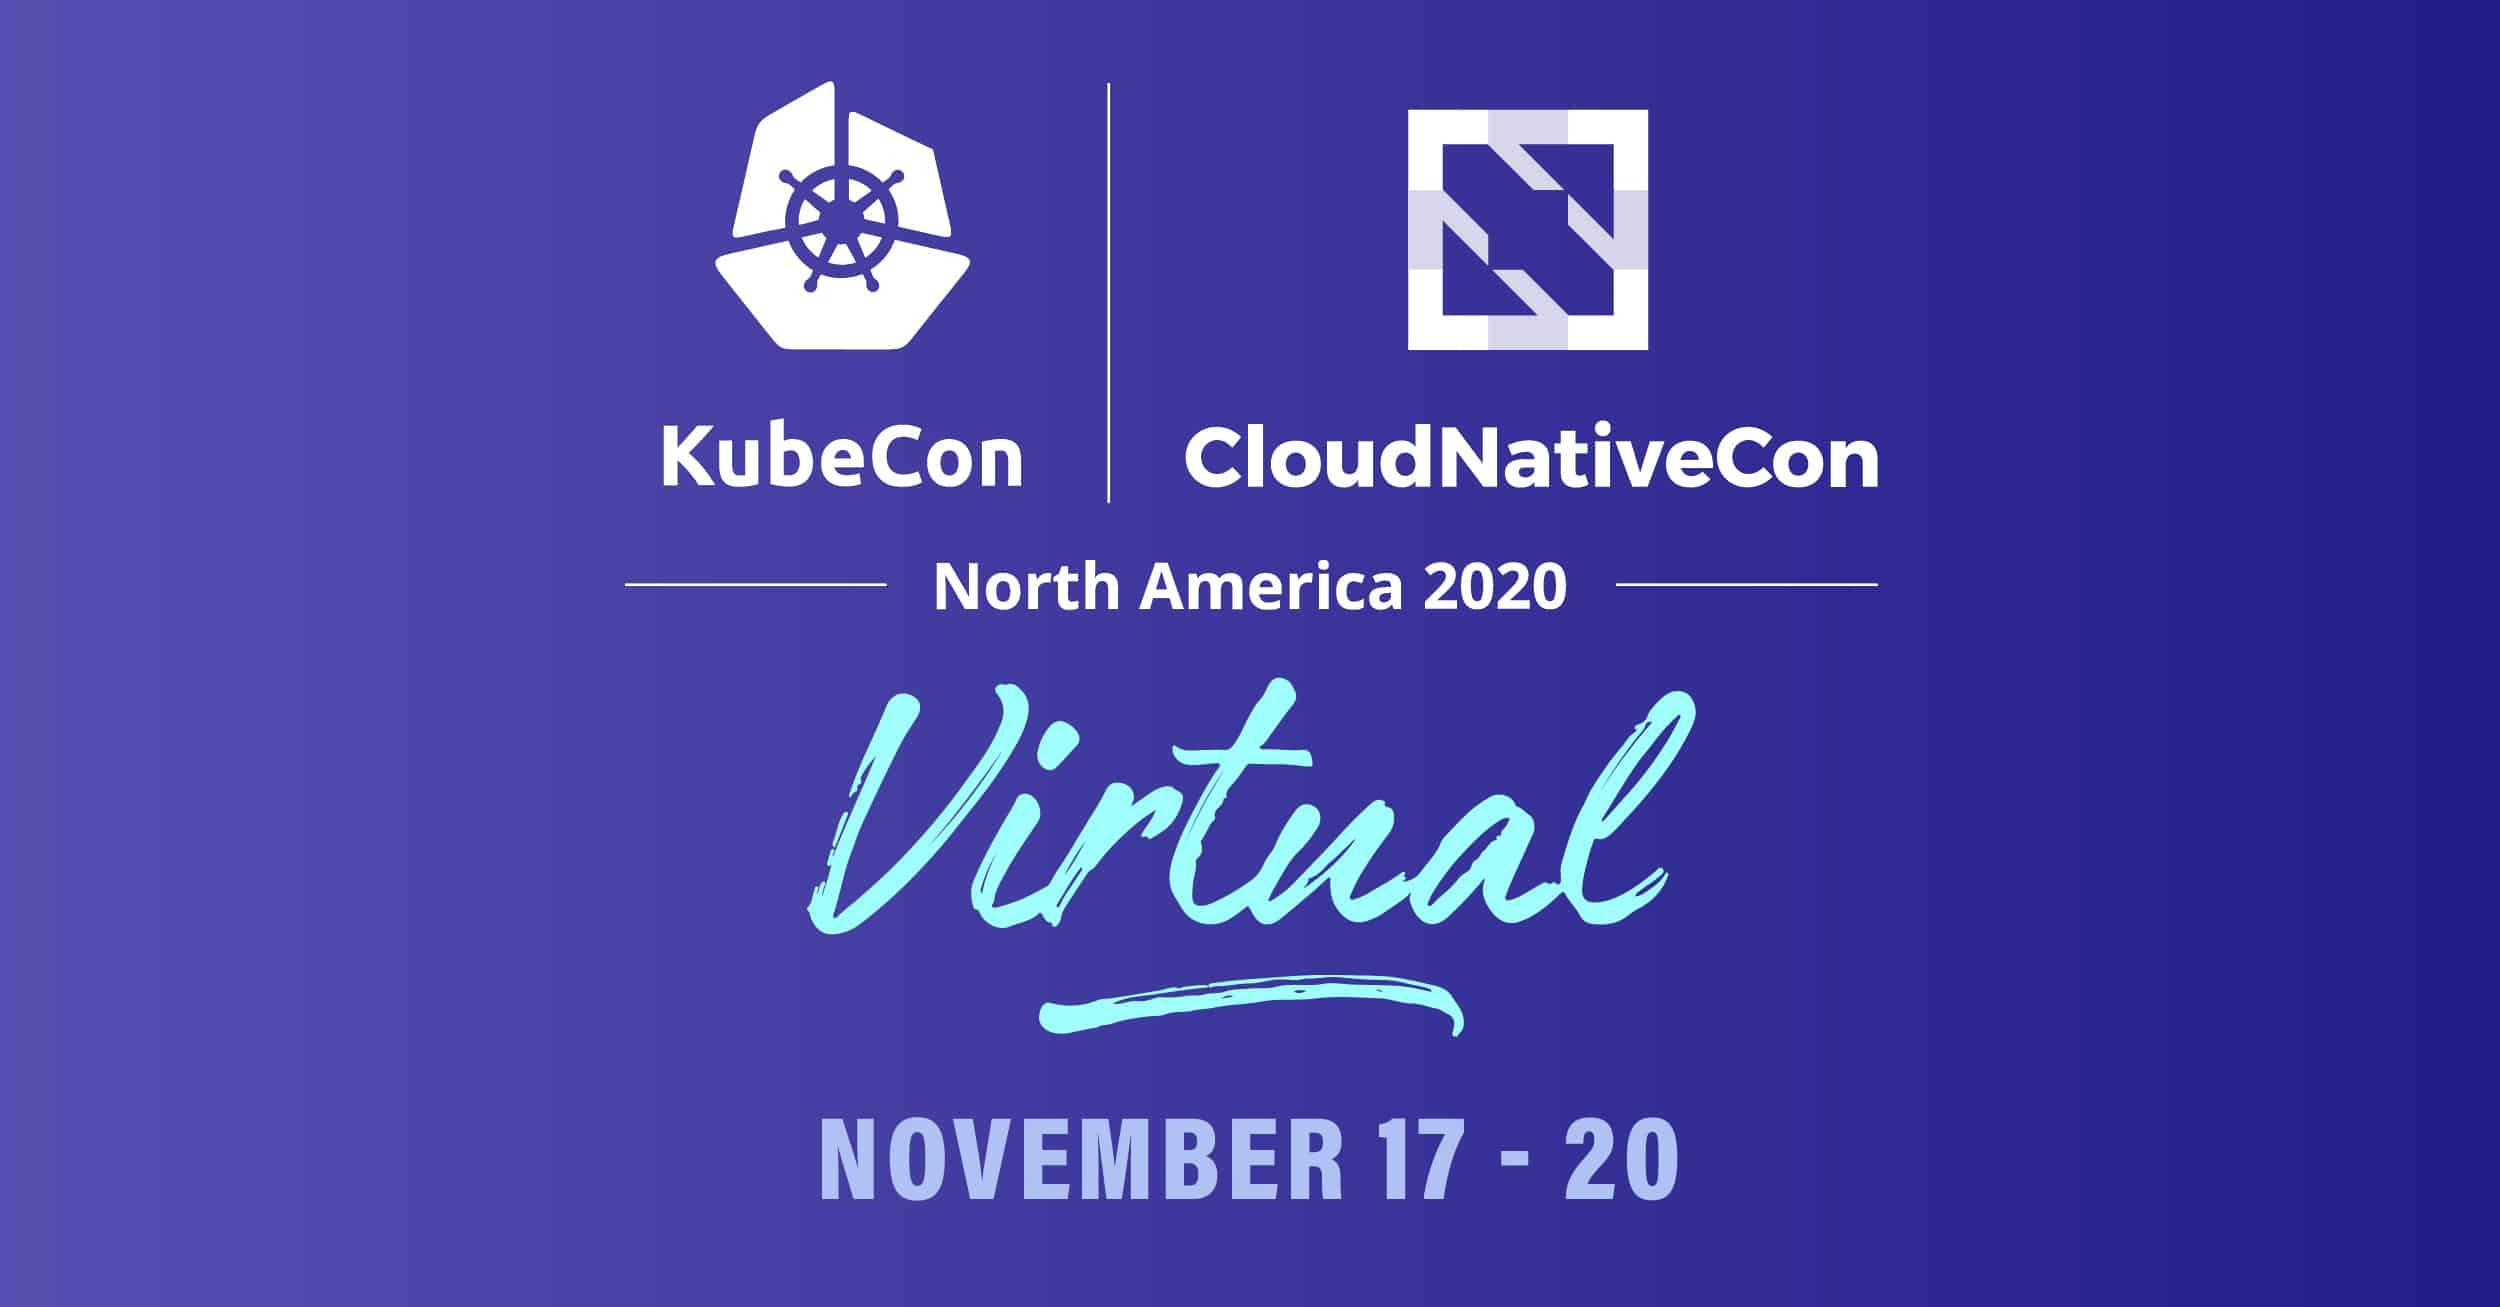 KubeCon North America 2020